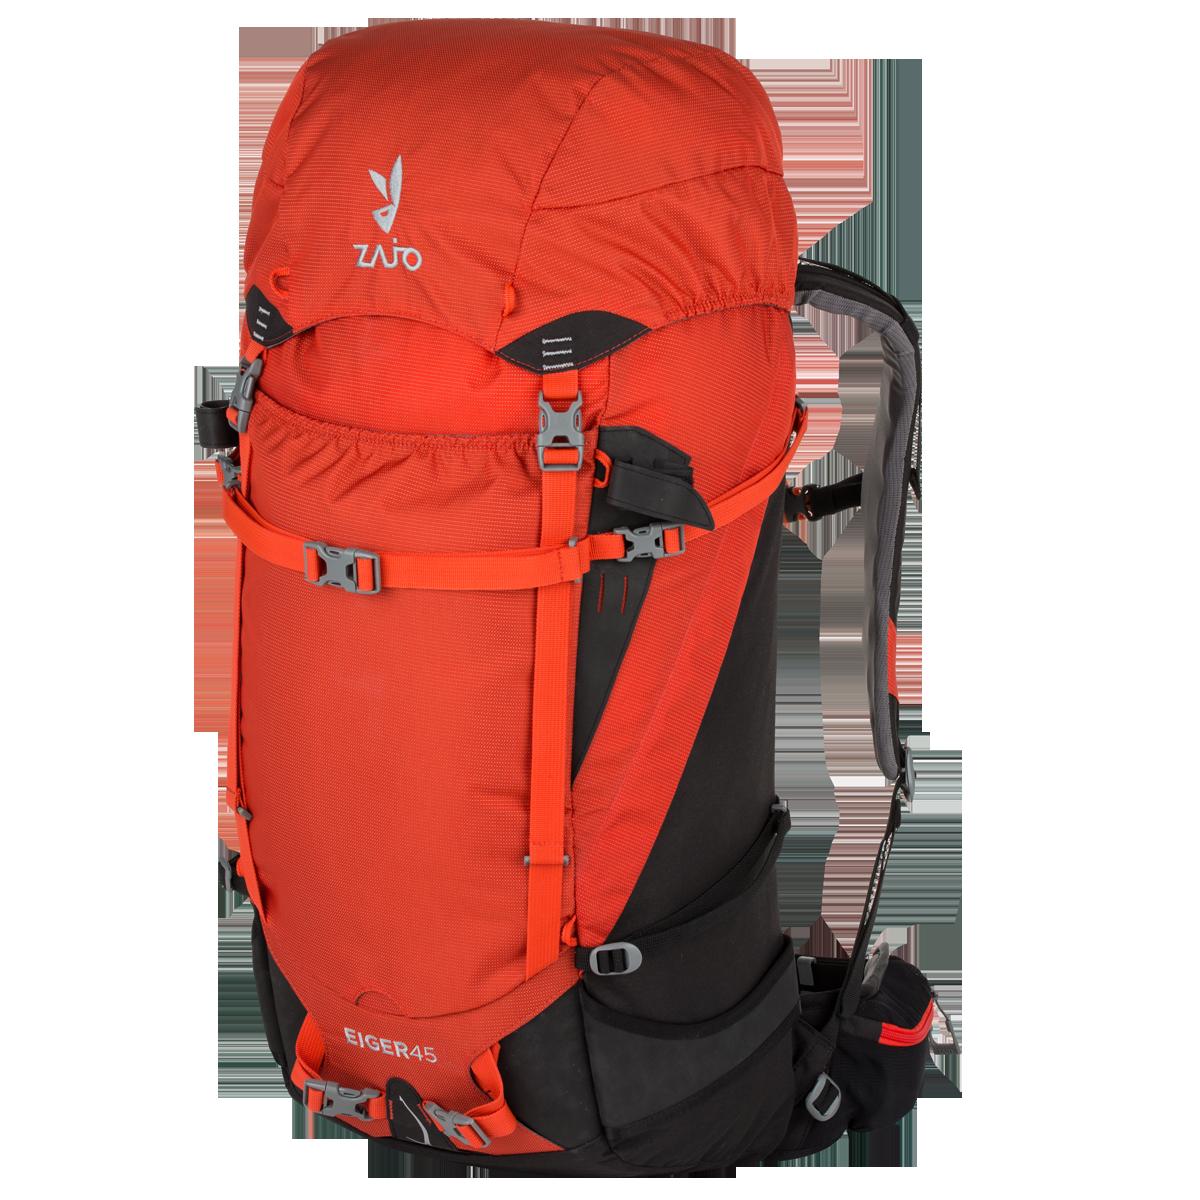 47b482037 Zajo Eiger 45 L Backpack - SPORTCOM Outdoor